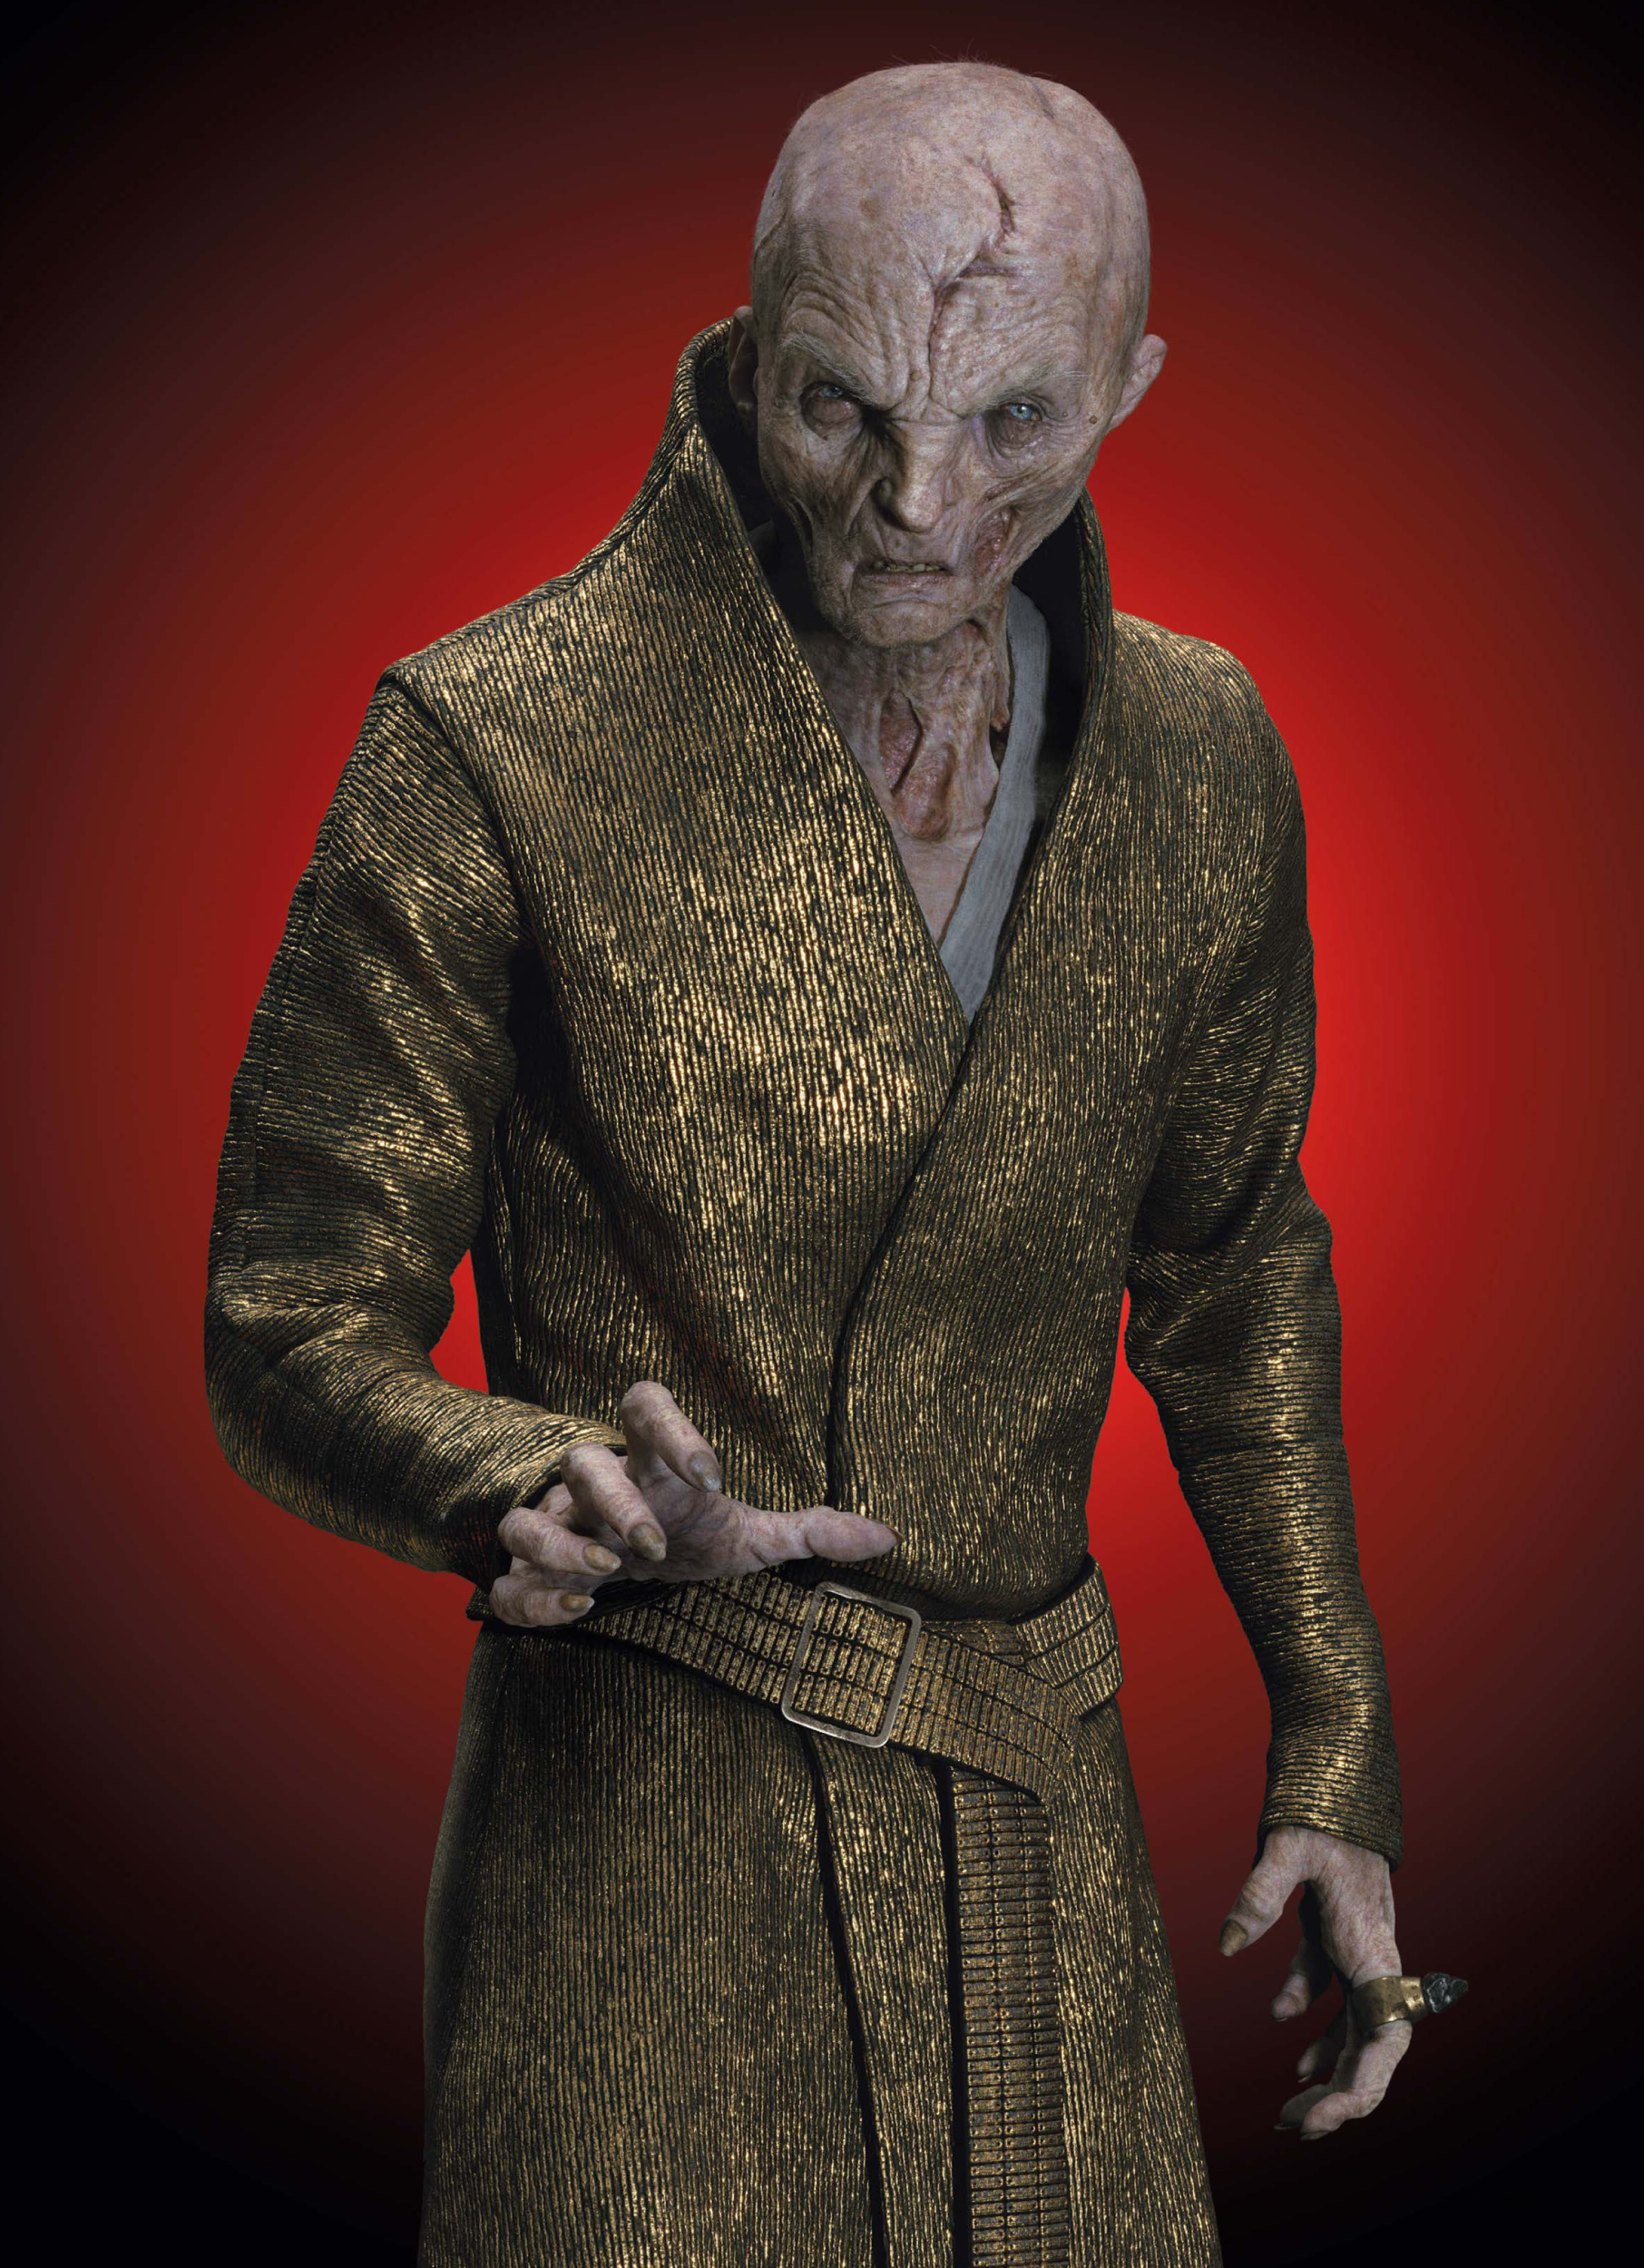 Supreme Leader Snoke Wickedpedia Fandom Powered By Wikia